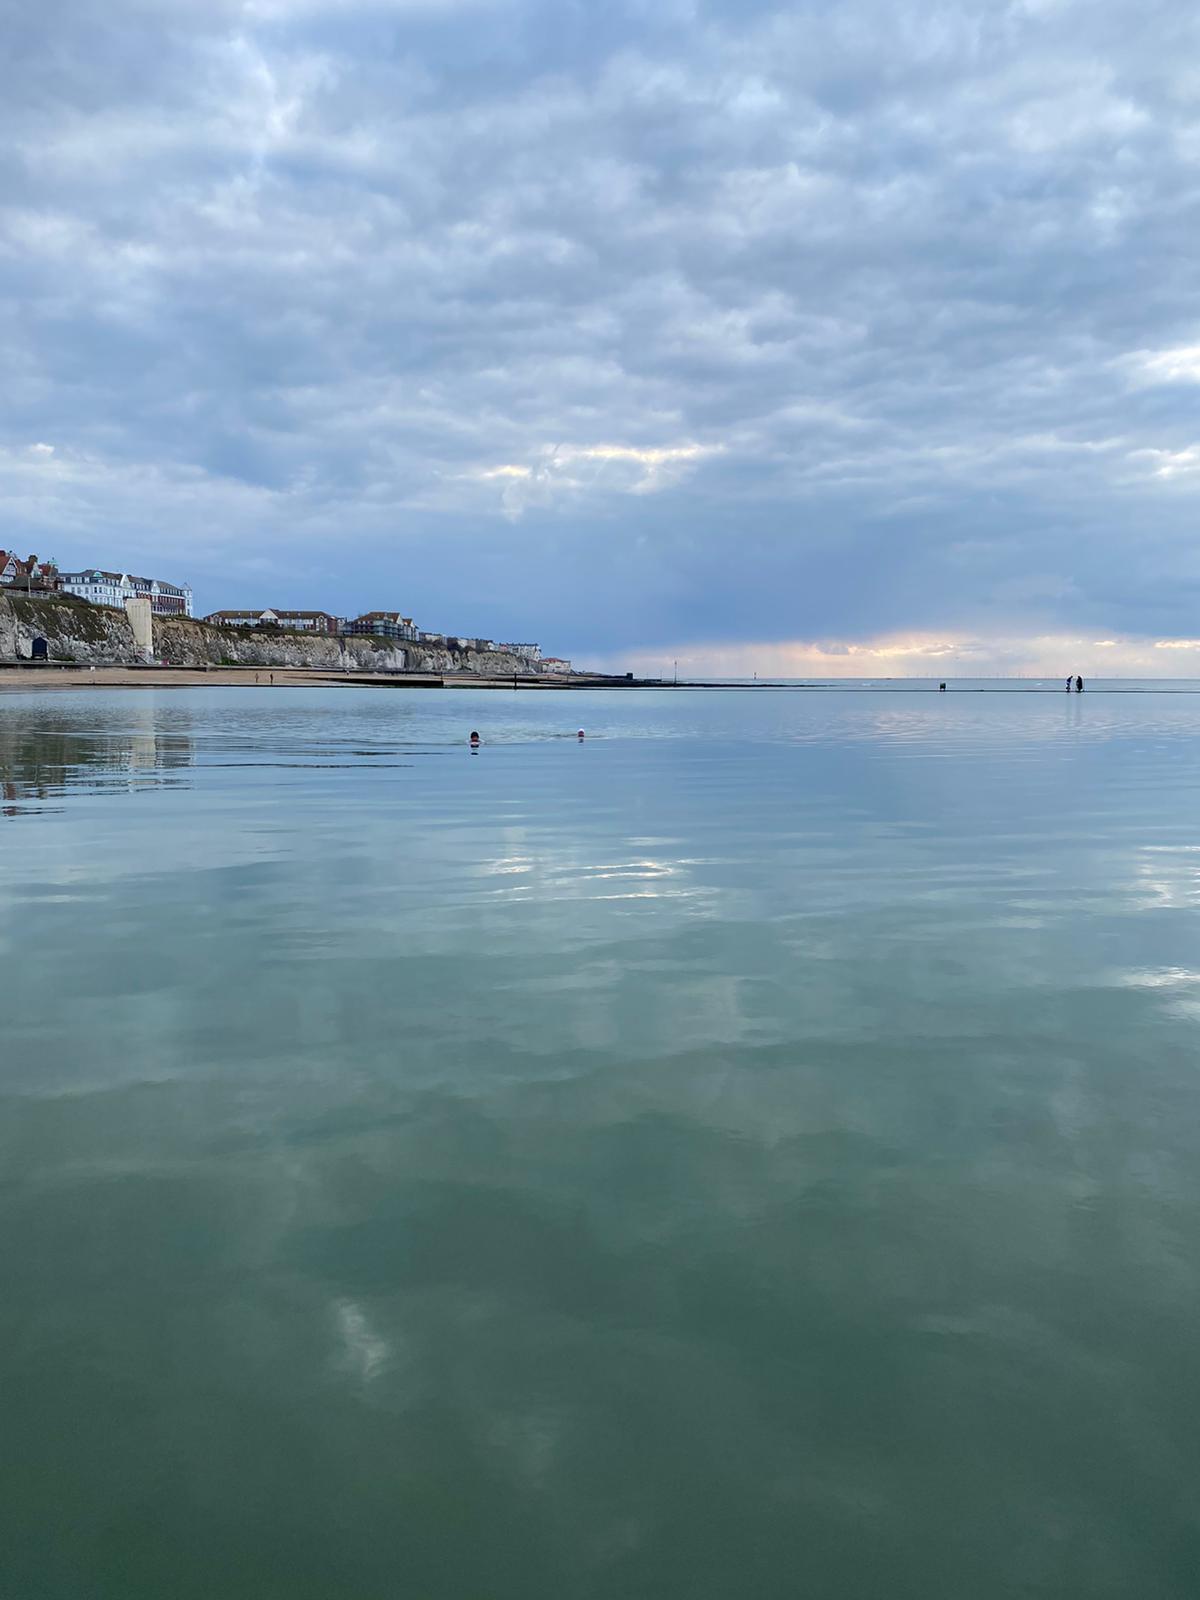 Swimming in the sea in the UK-8c078fb4-71c8-49a8-aaa4-6cef60518a7c-jpg